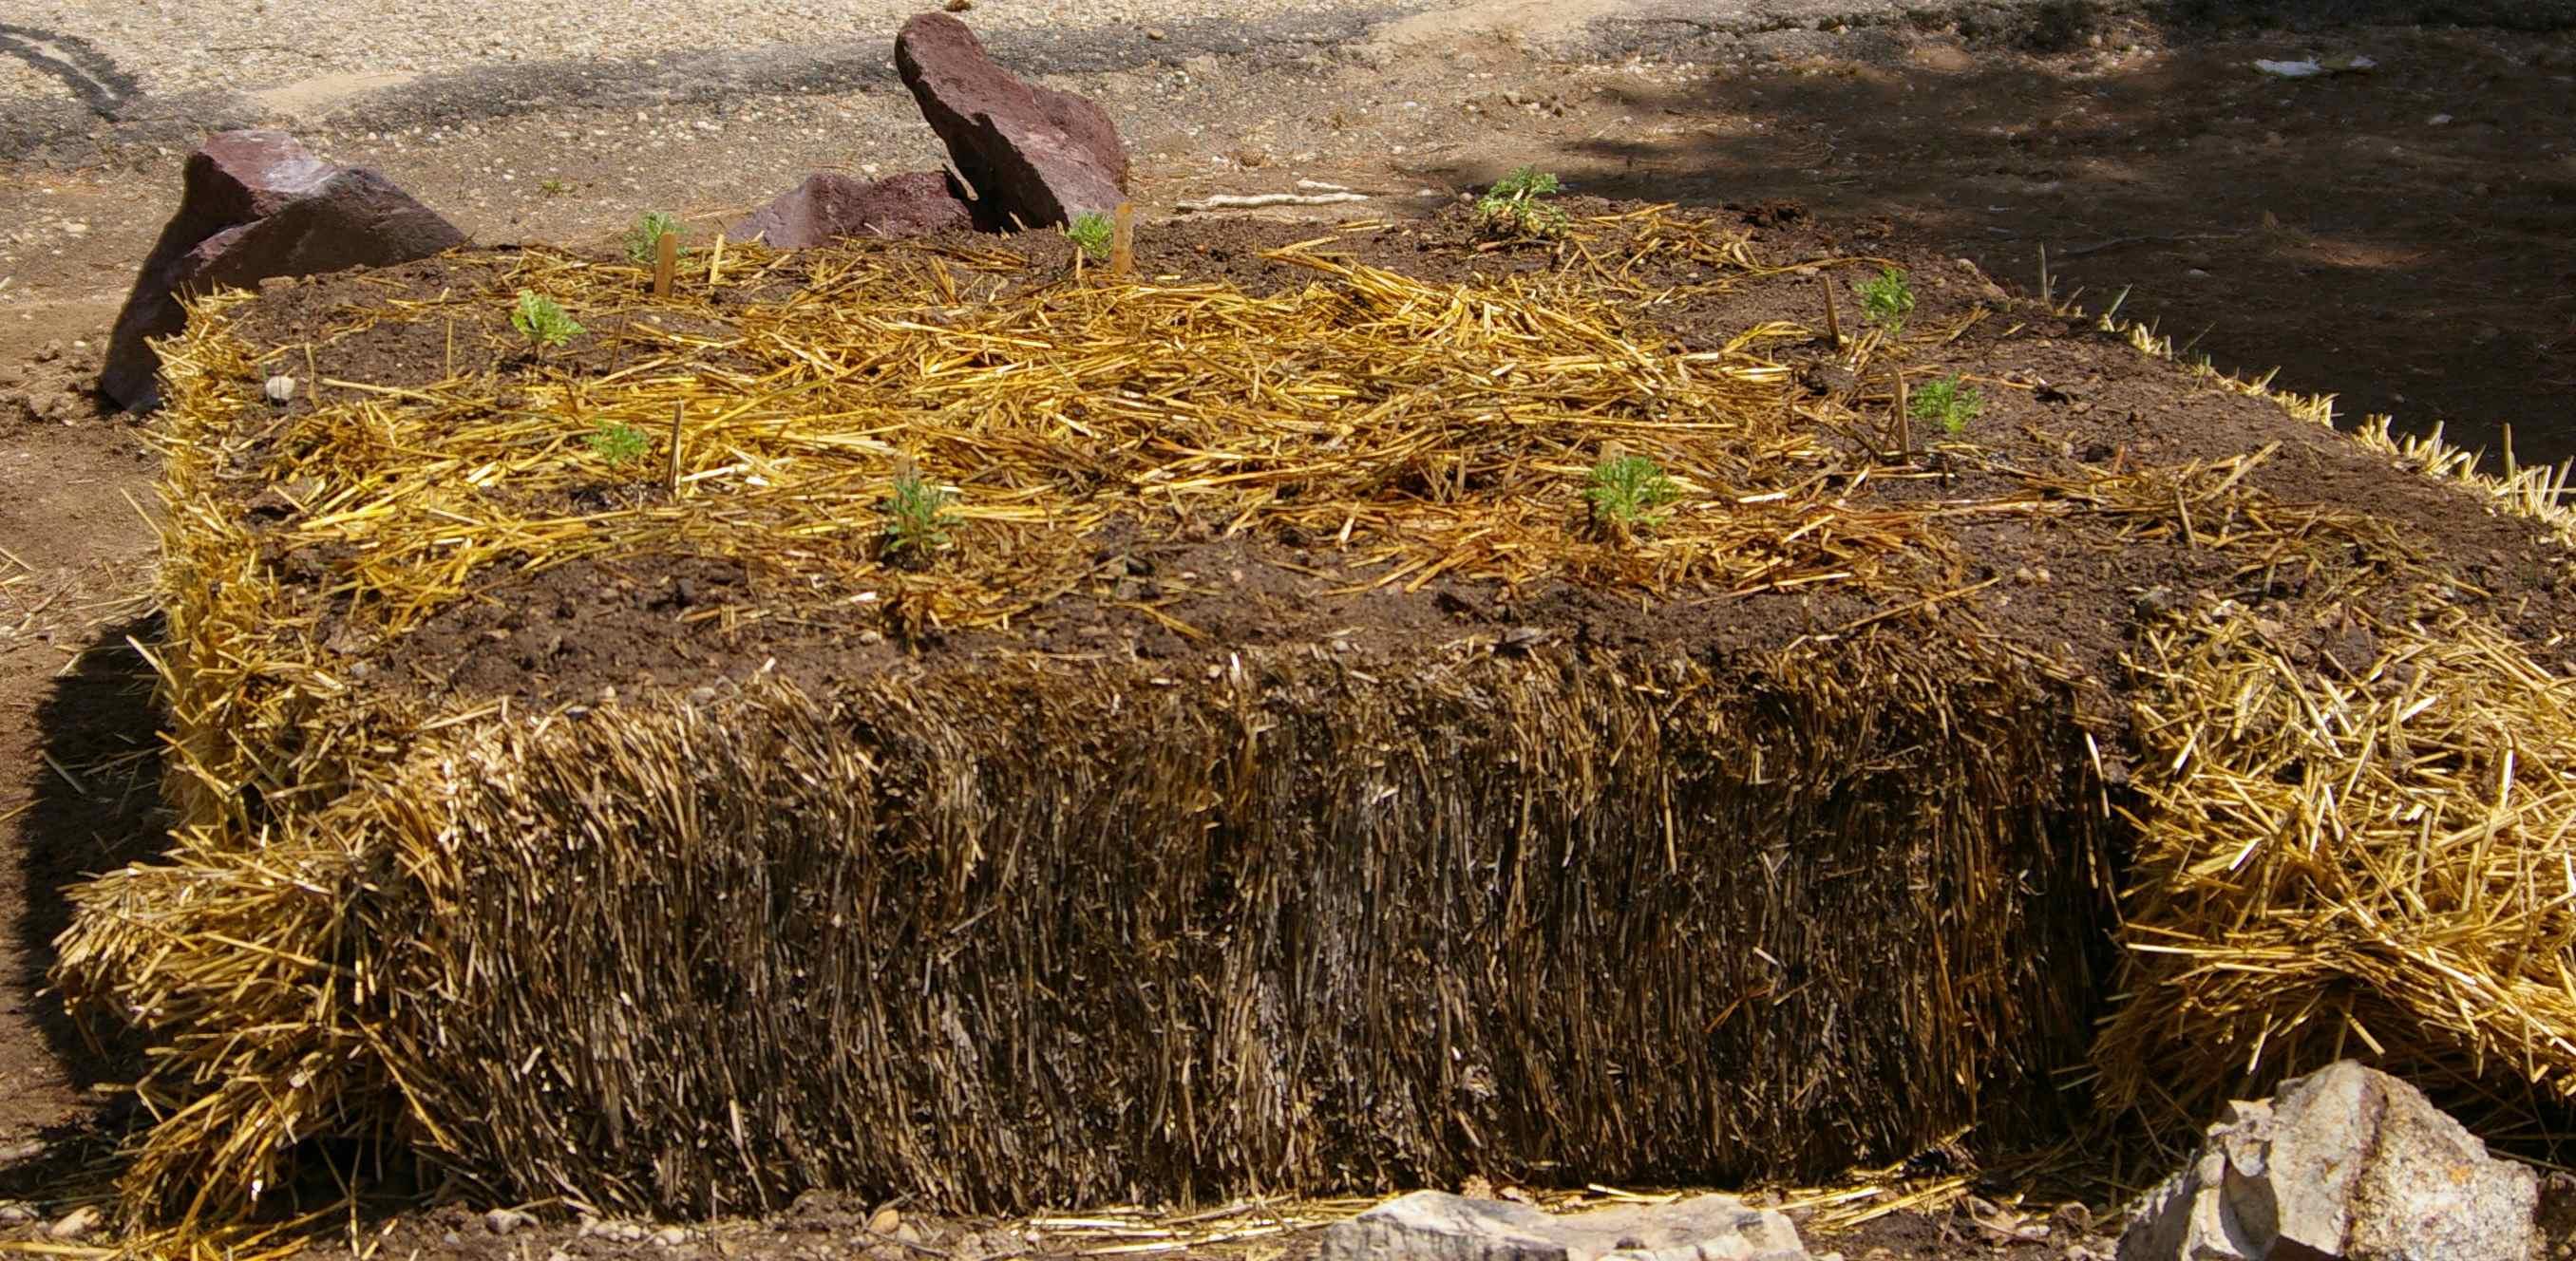 Transplanting into a Straw Bale Garden